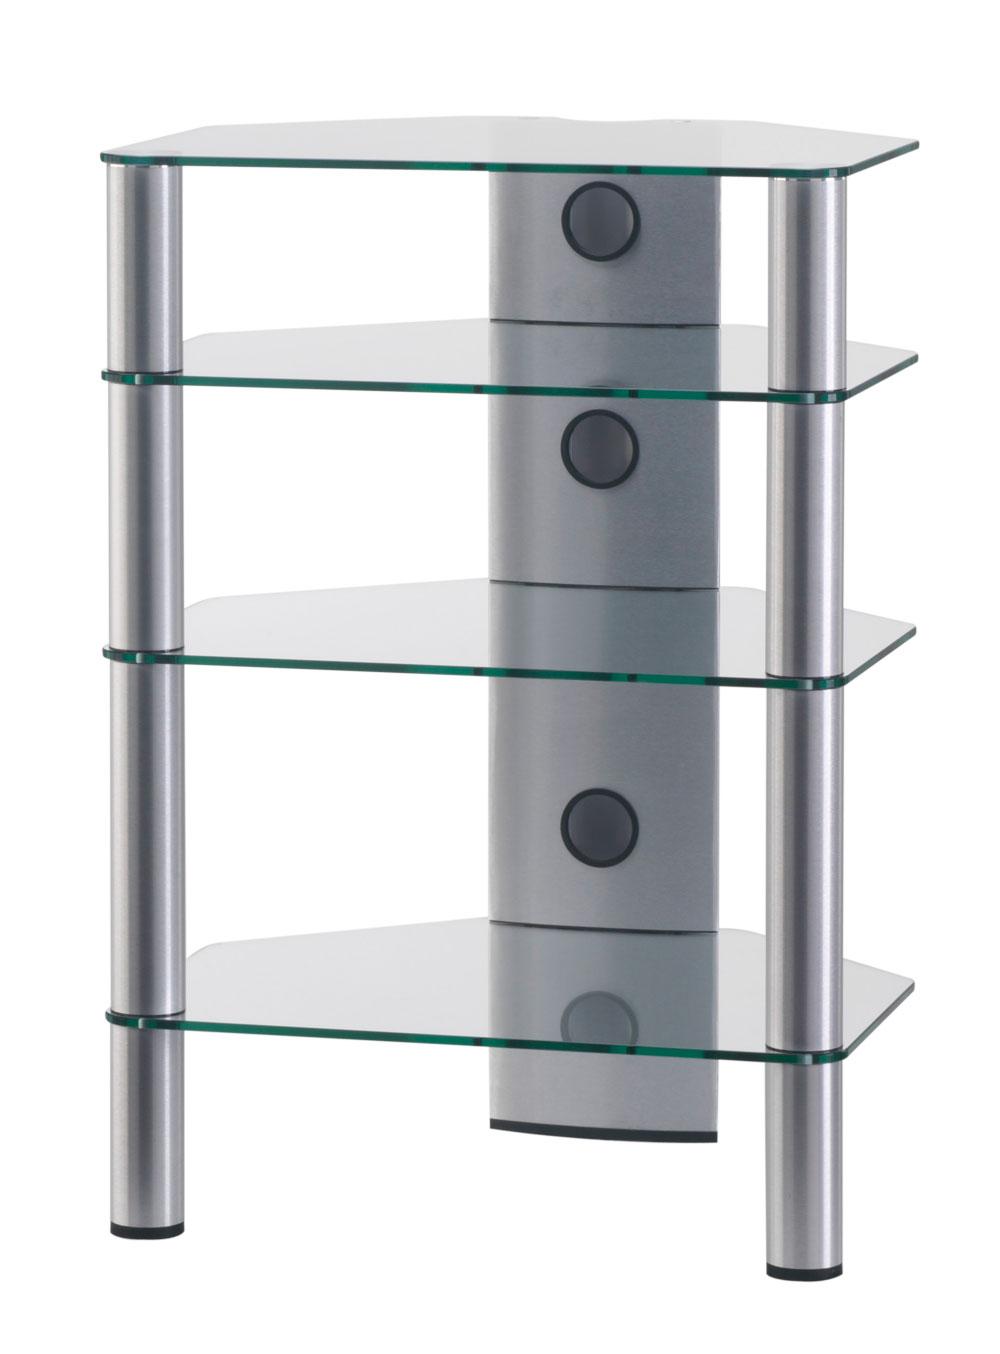 Meuble hifi sonorous rx2140 c slv meuble tv hifi suisse - Meuble tv chaine hifi ...